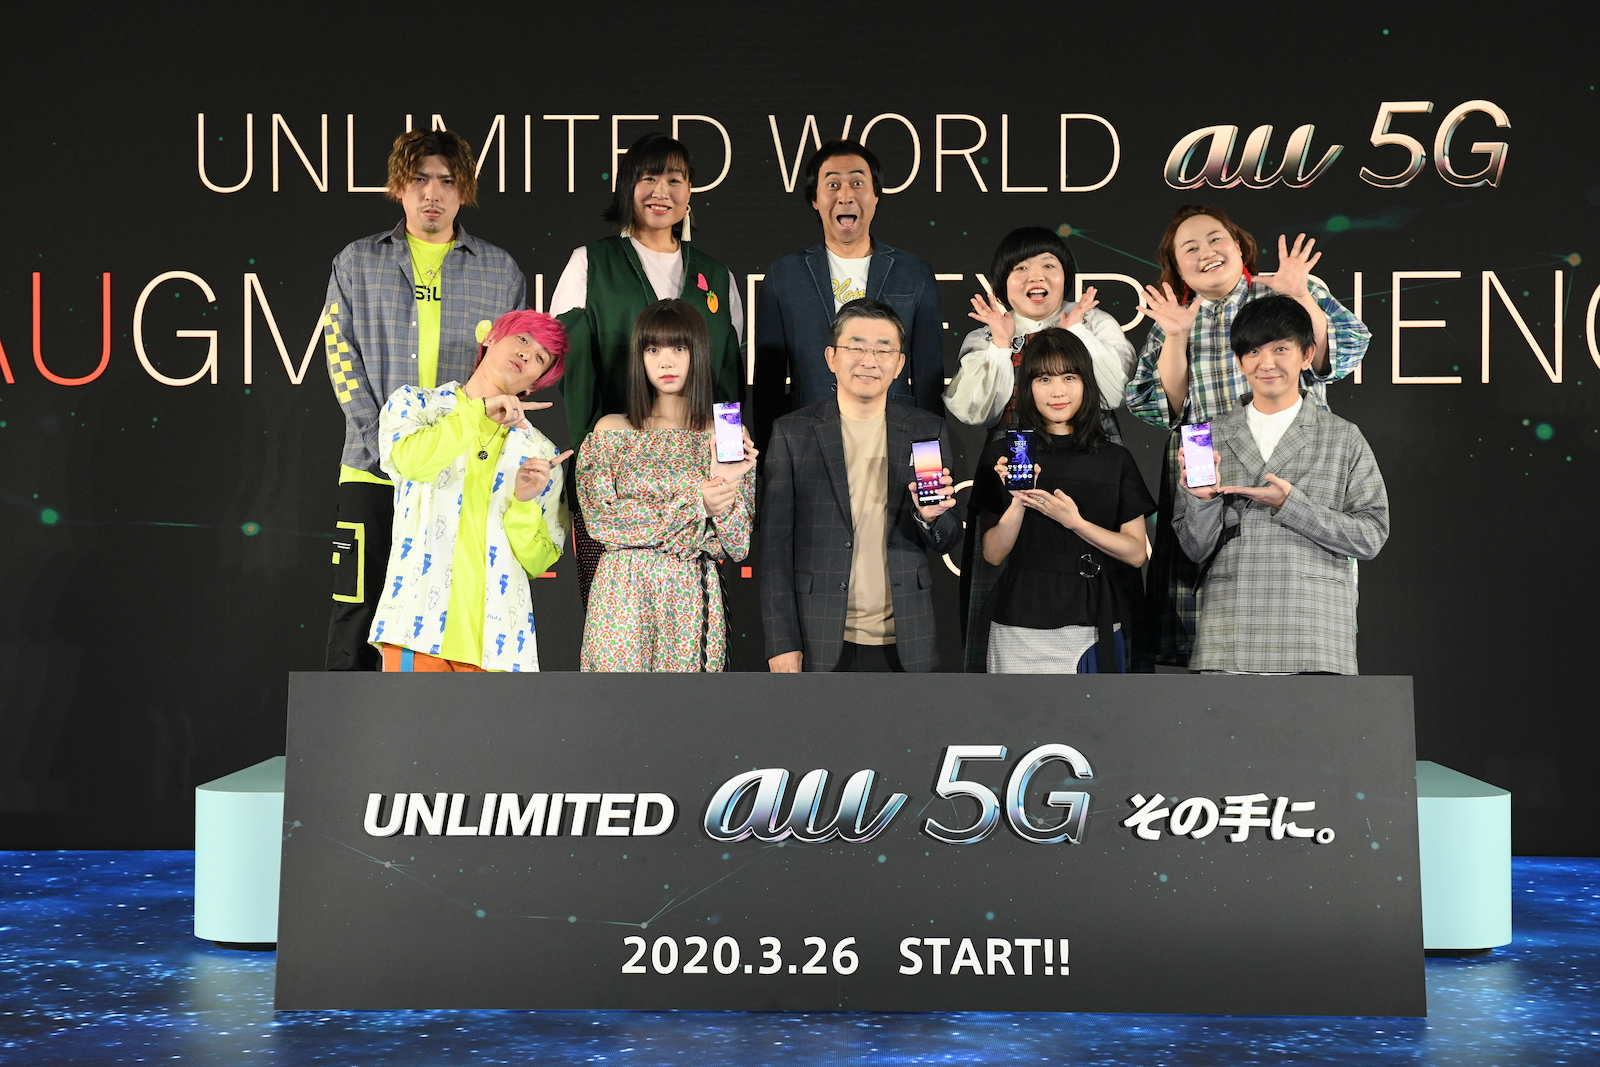 au 5G、料金プランはデータ無制限で月額8,650円。26日開始